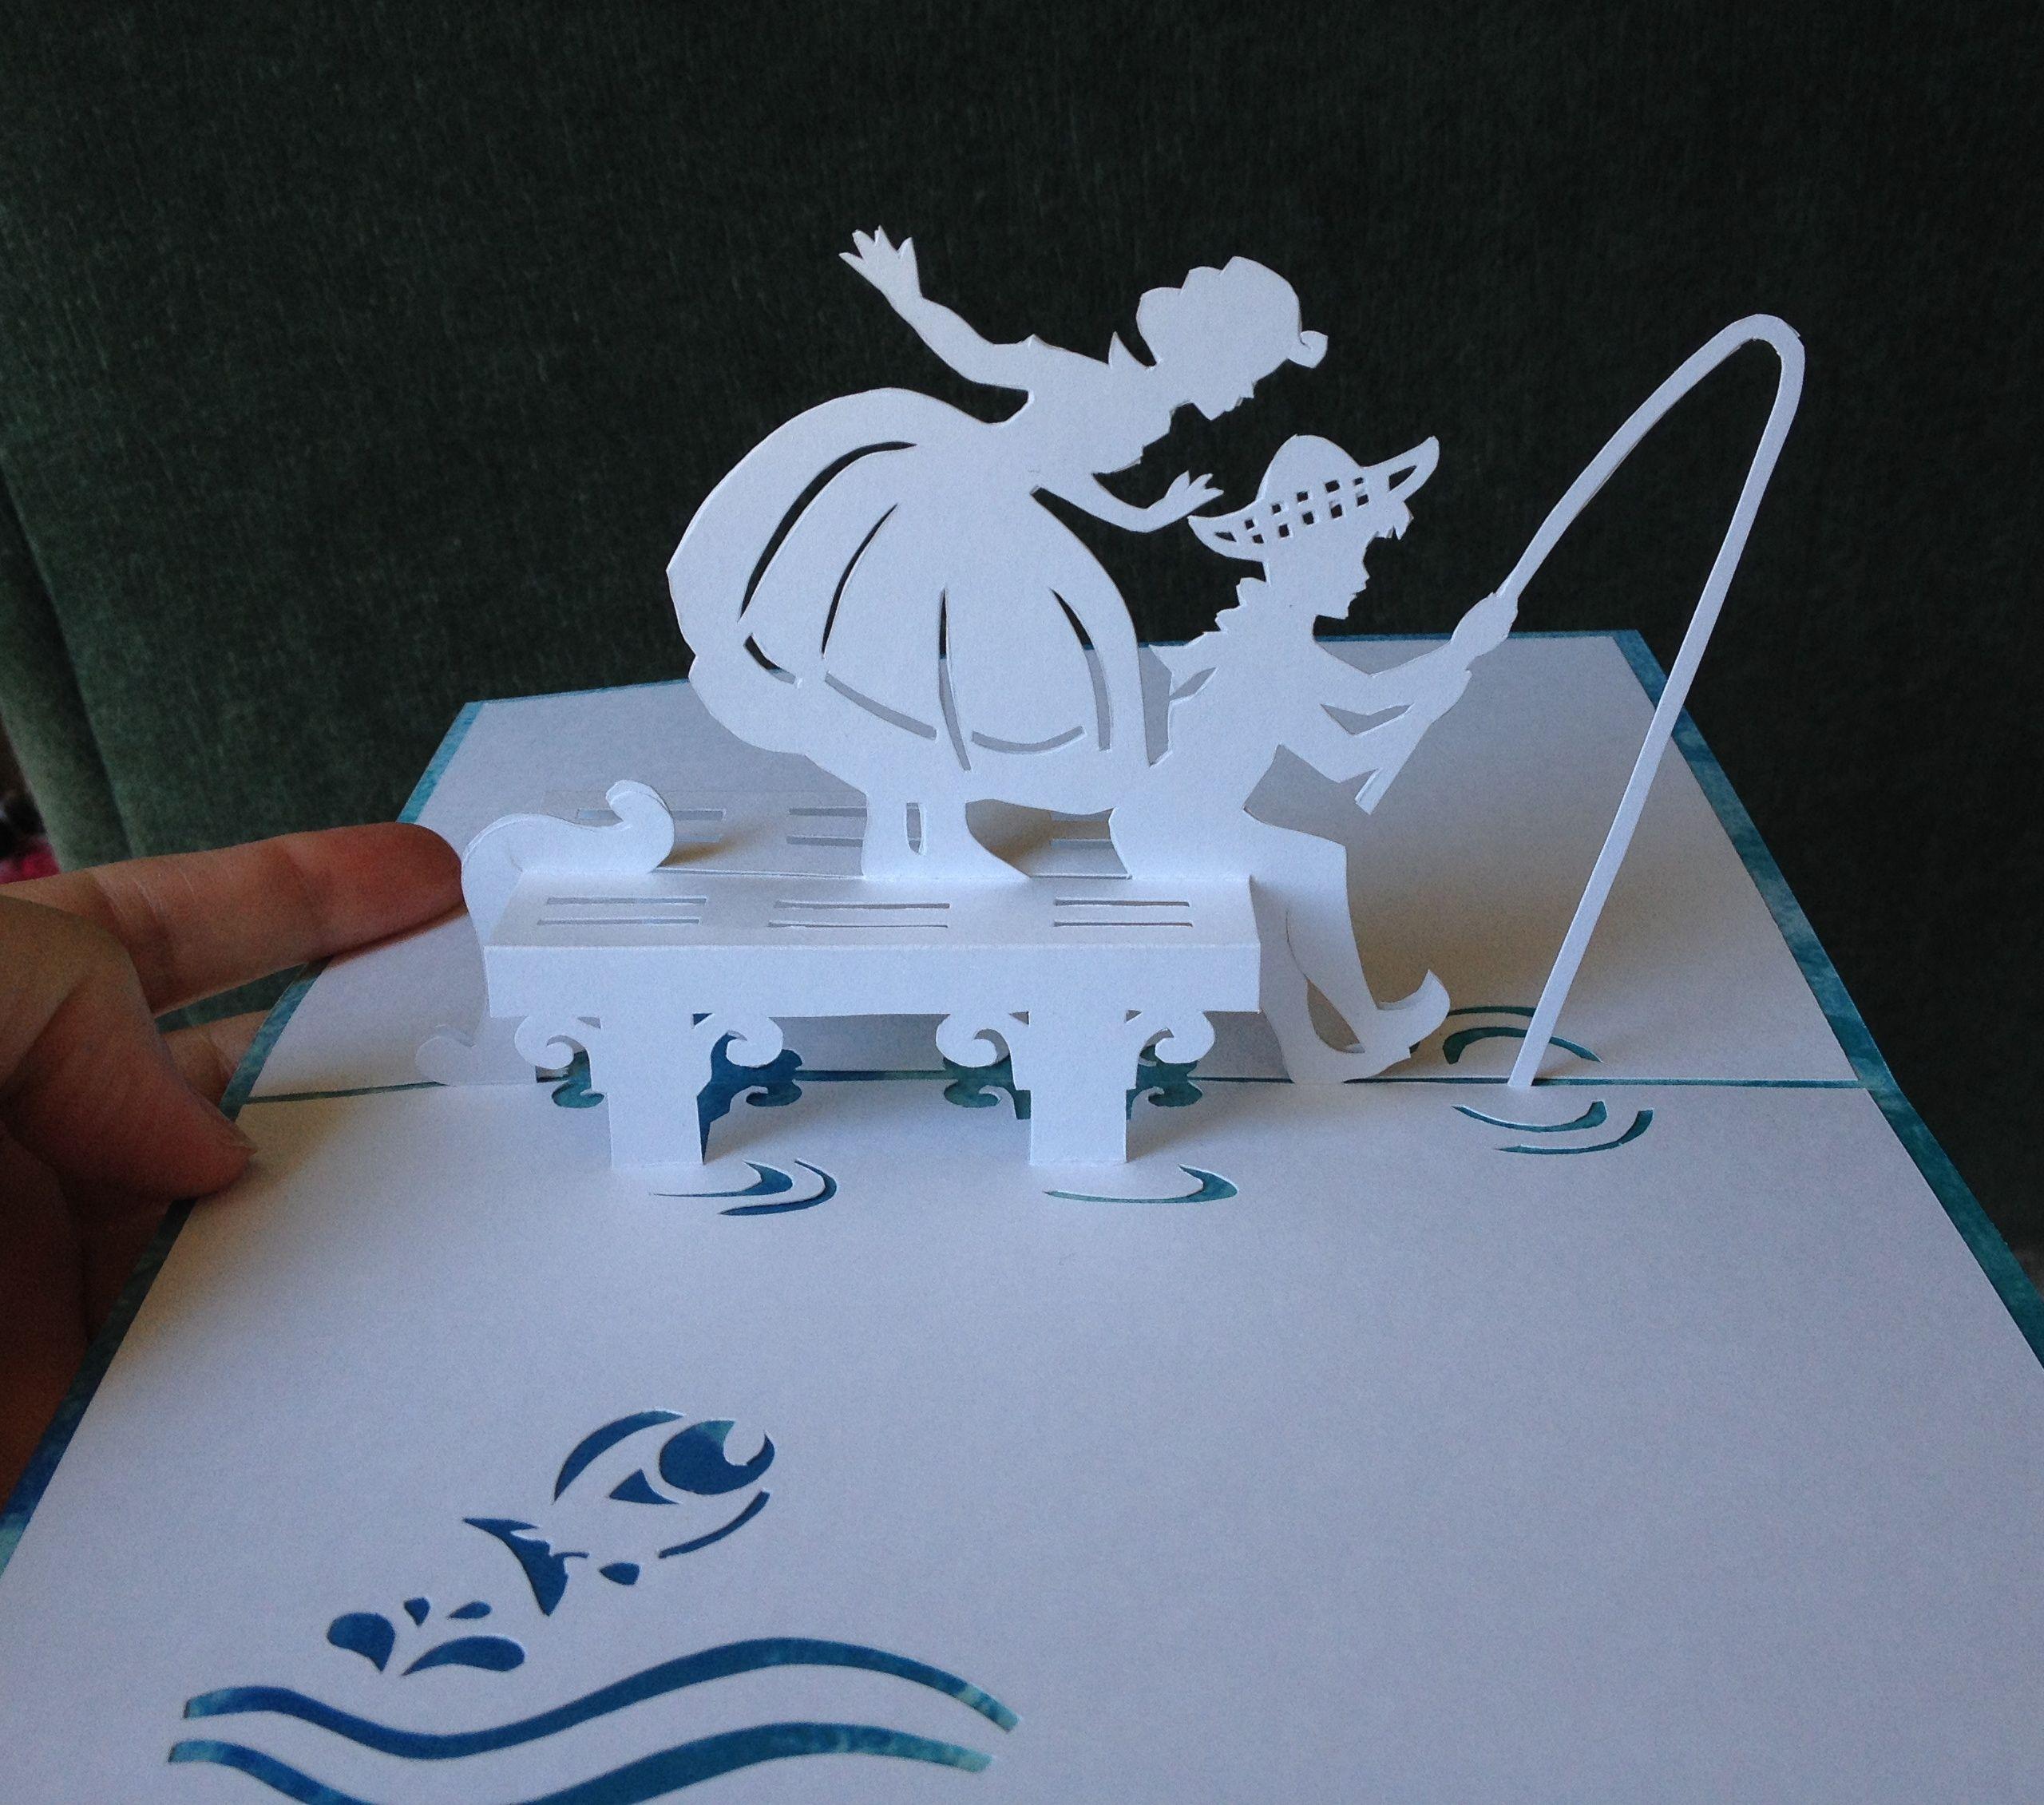 fishing pop up card template from cahier de kirigami no 16